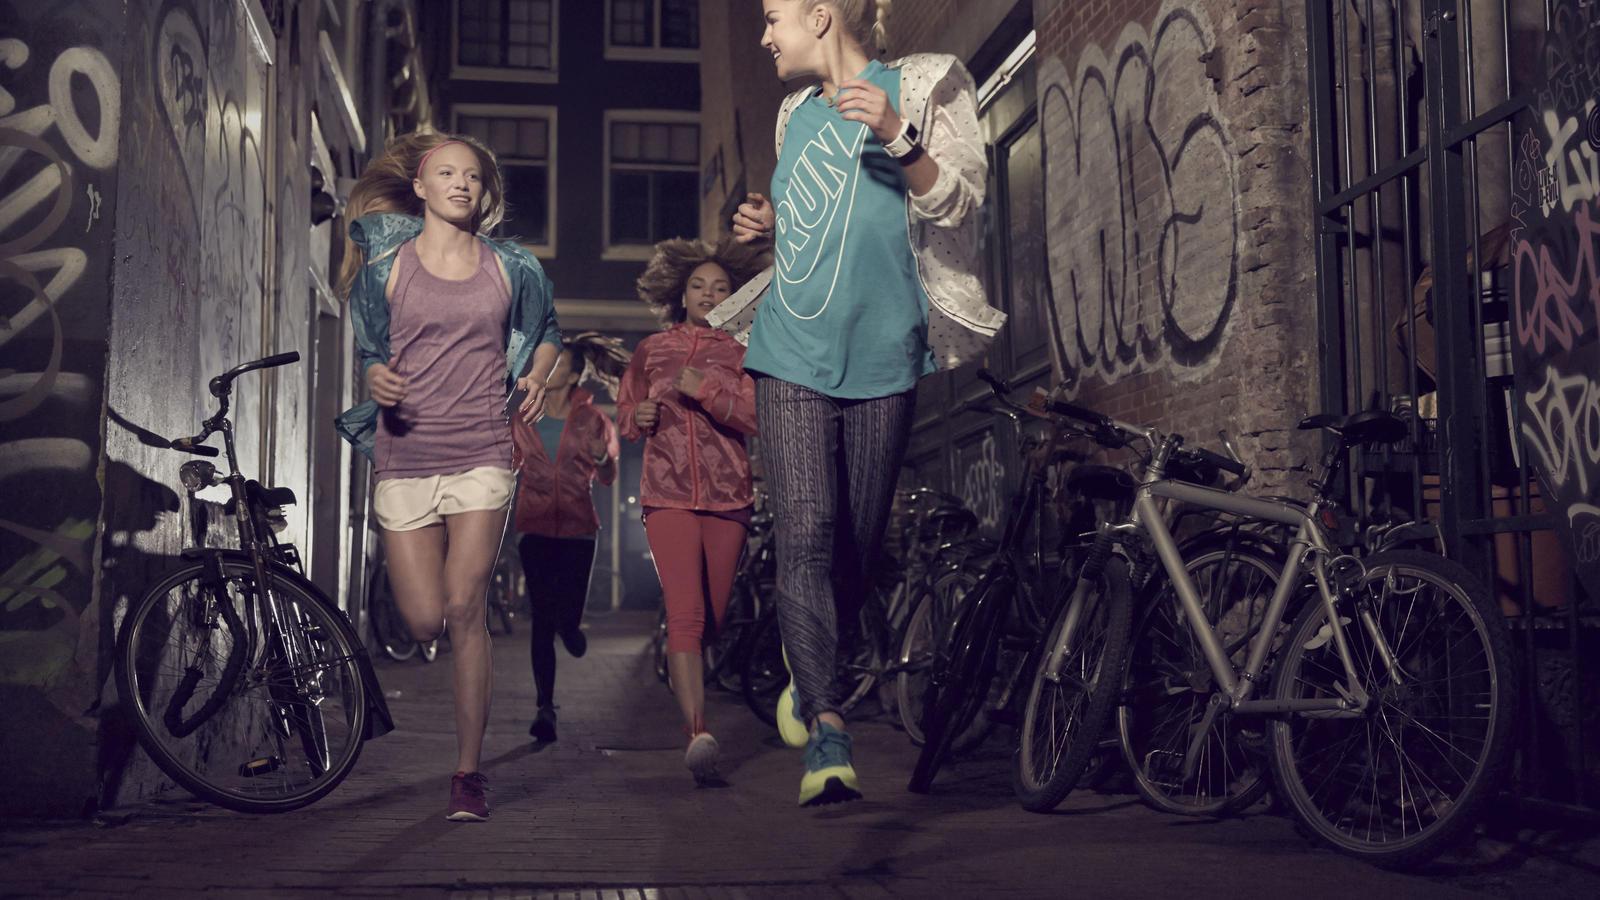 Wotn Amsterdam 2014